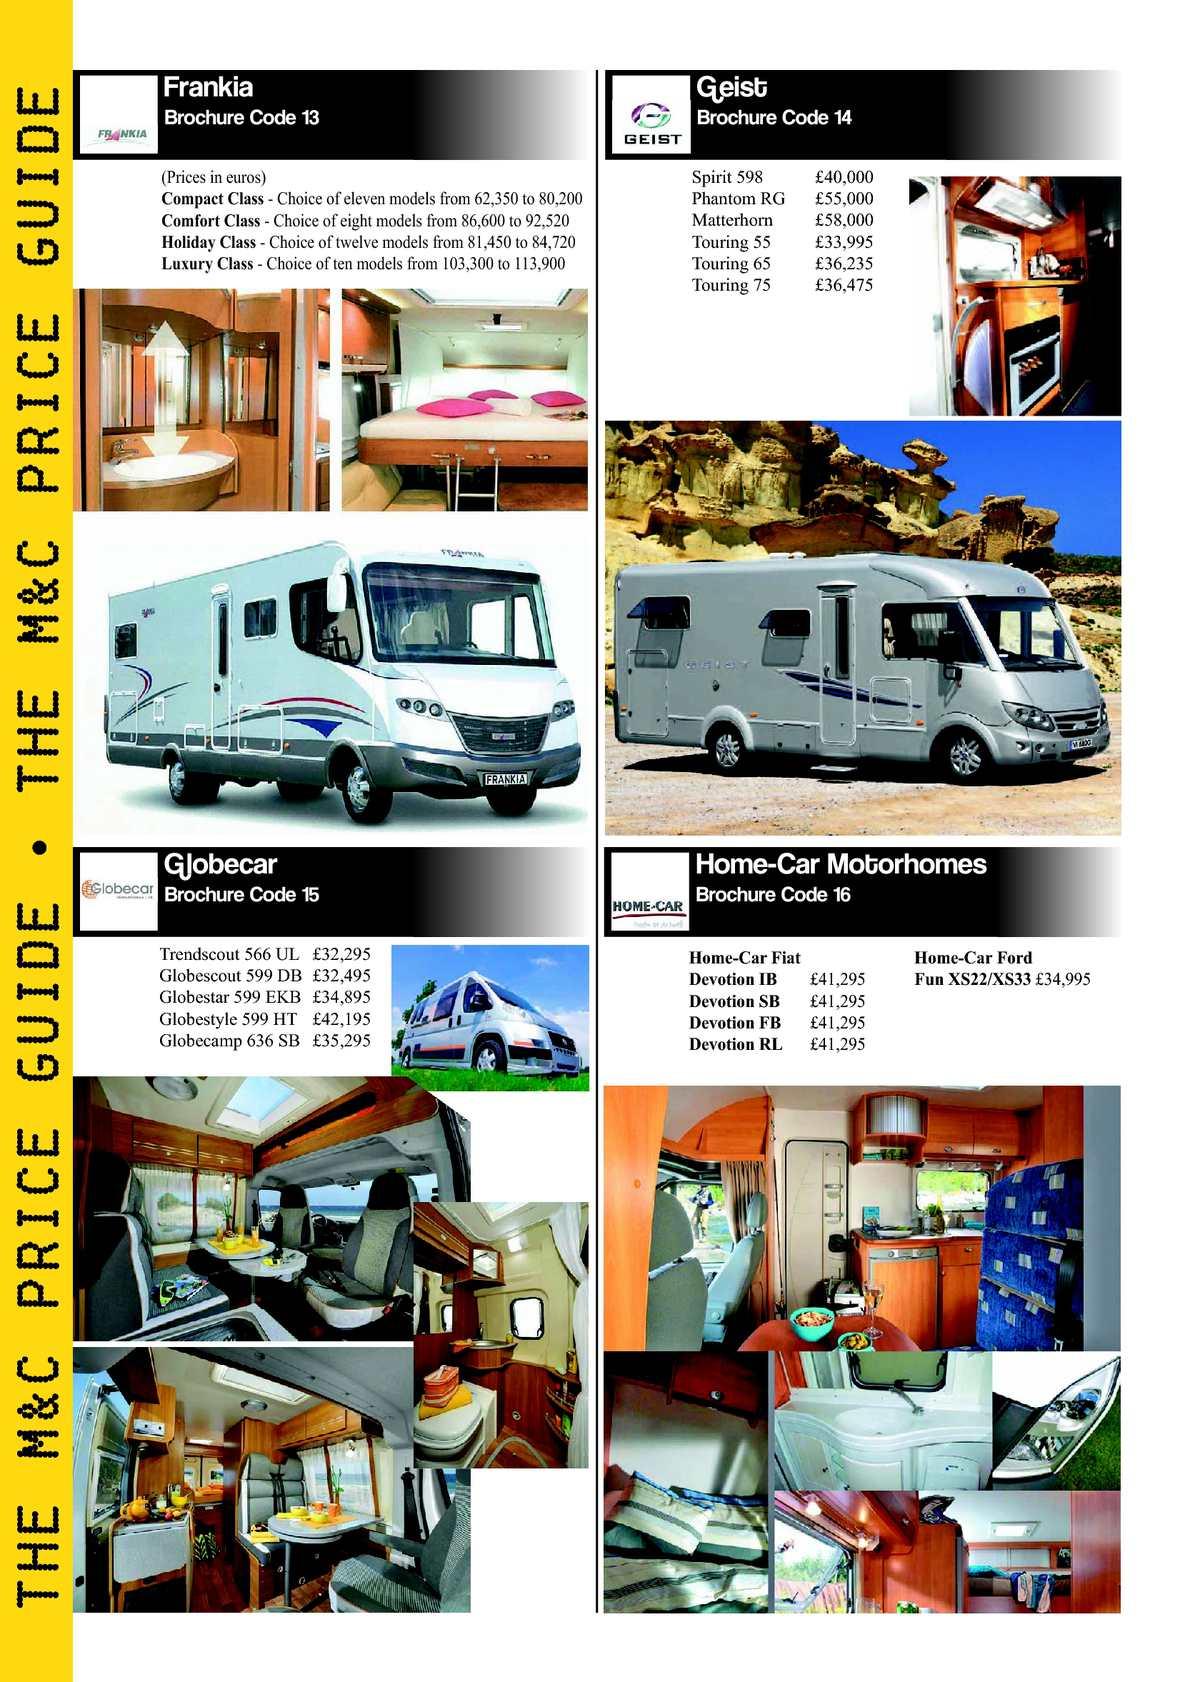 Feb 2013 motorhome campervan calameo downloader page 76 fandeluxe Gallery